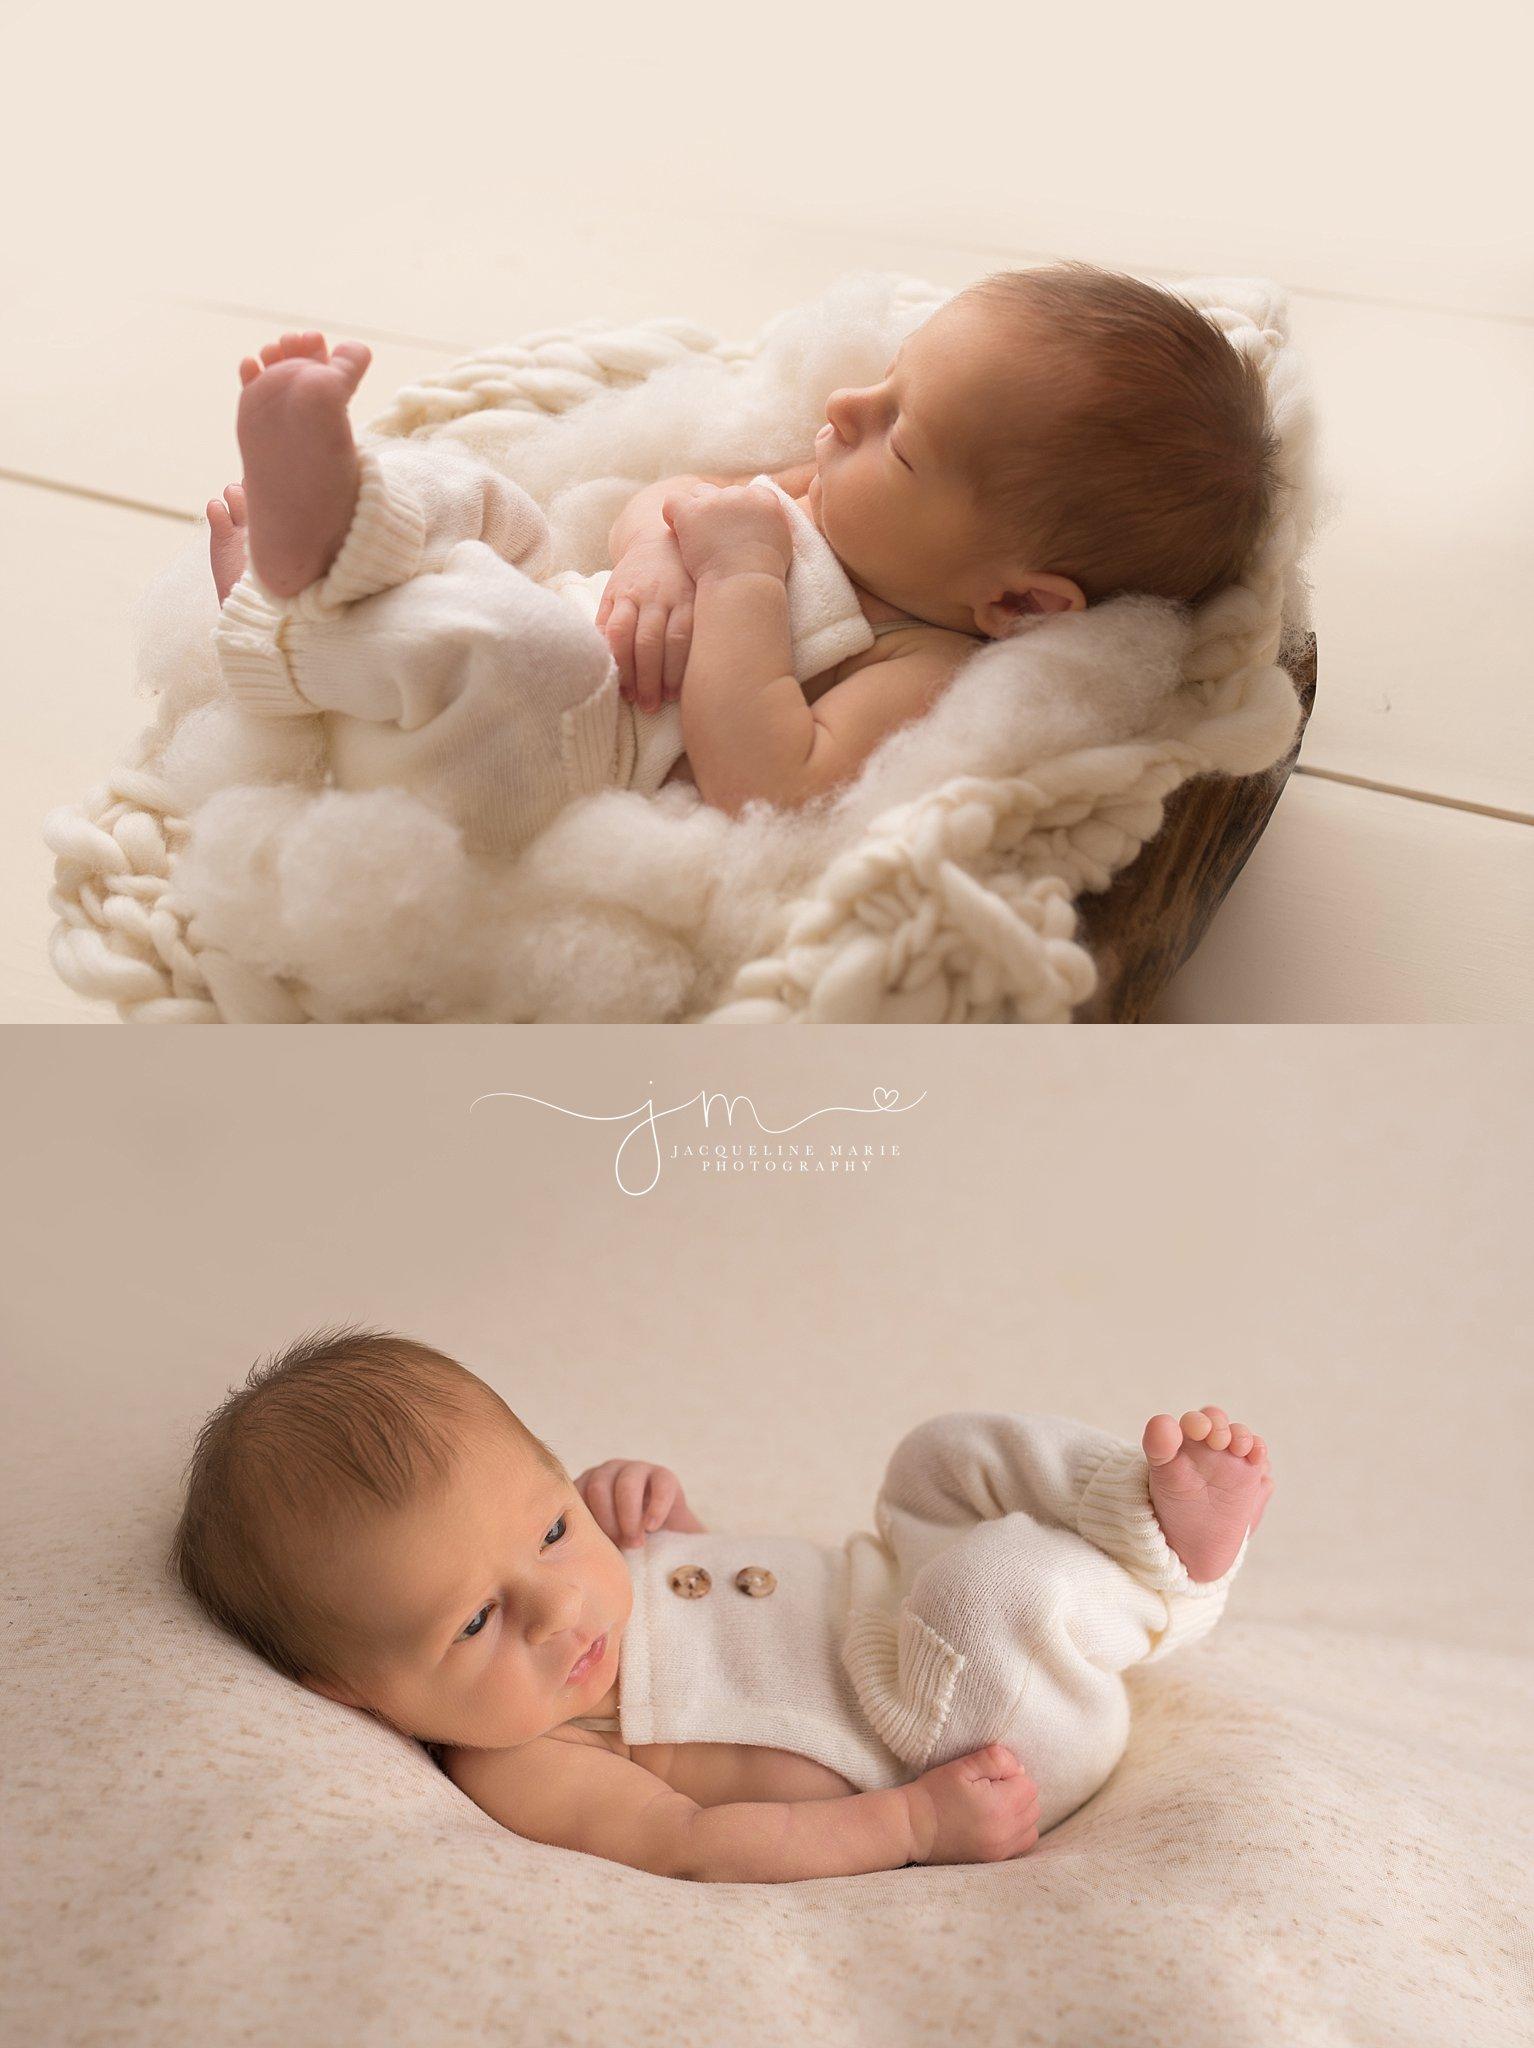 Newborn baby boy is awake with eyes open for newborn portraits in Columbus Ohio